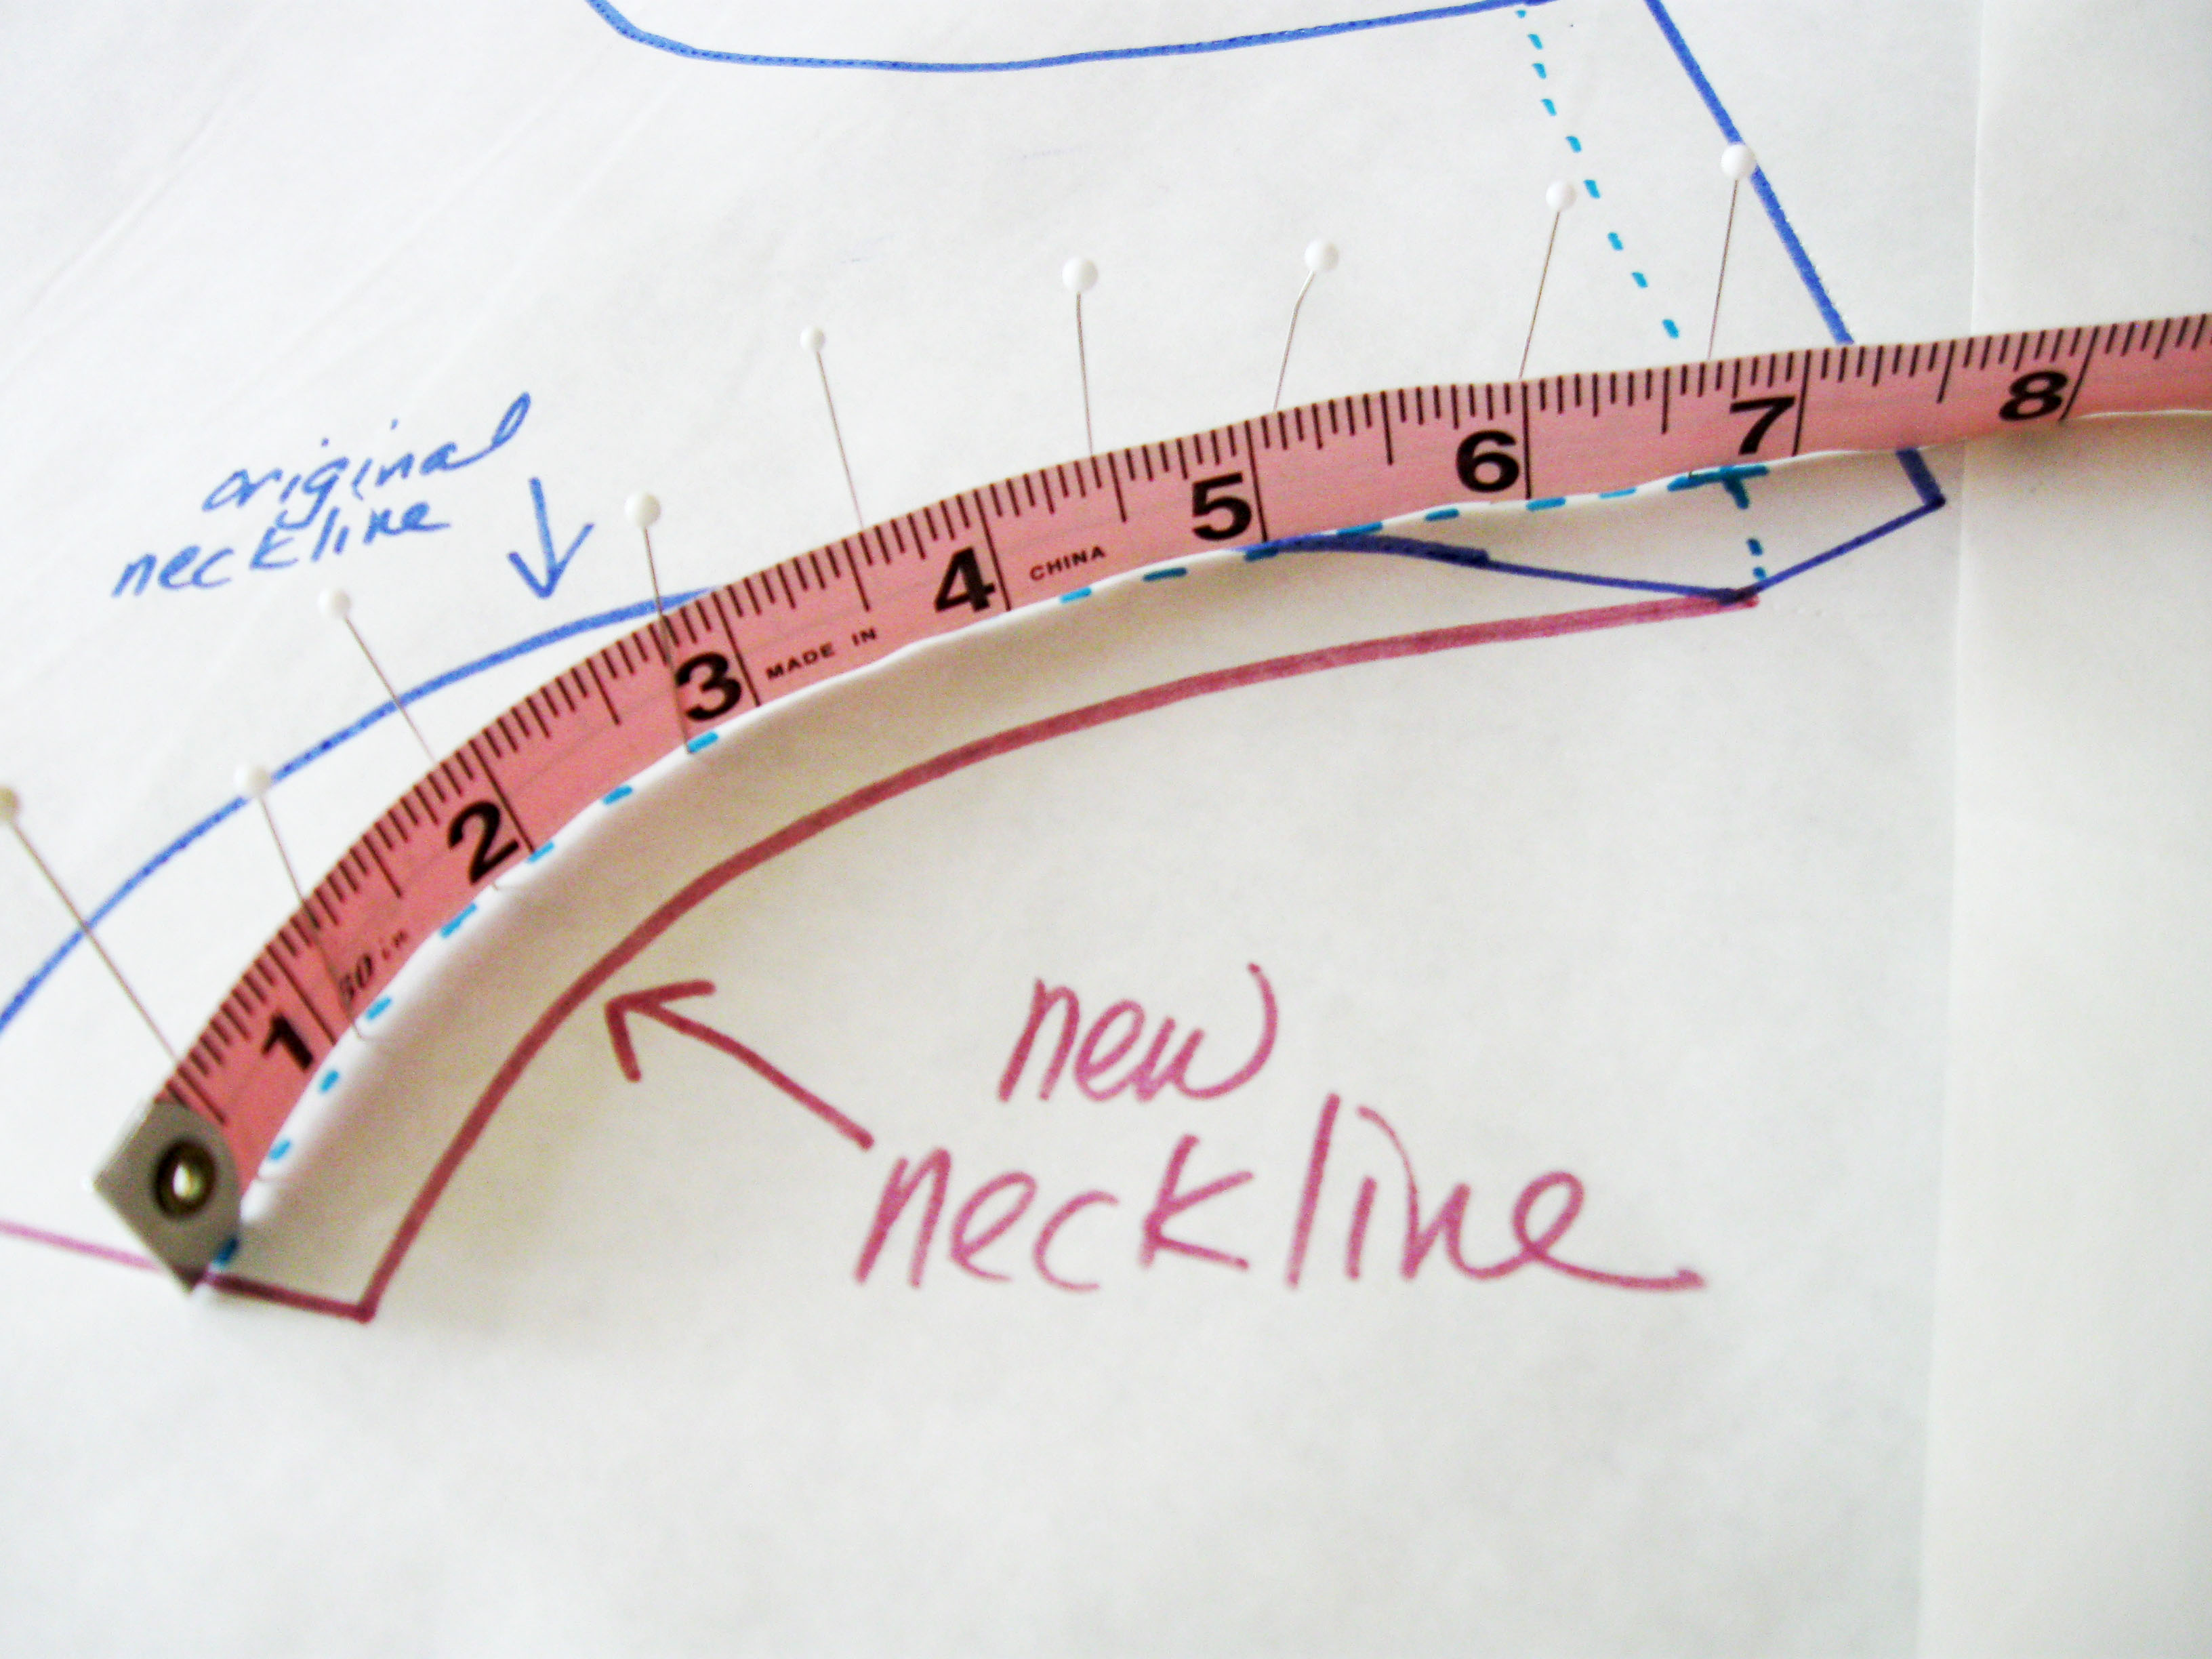 turn measureing tape on side to measure